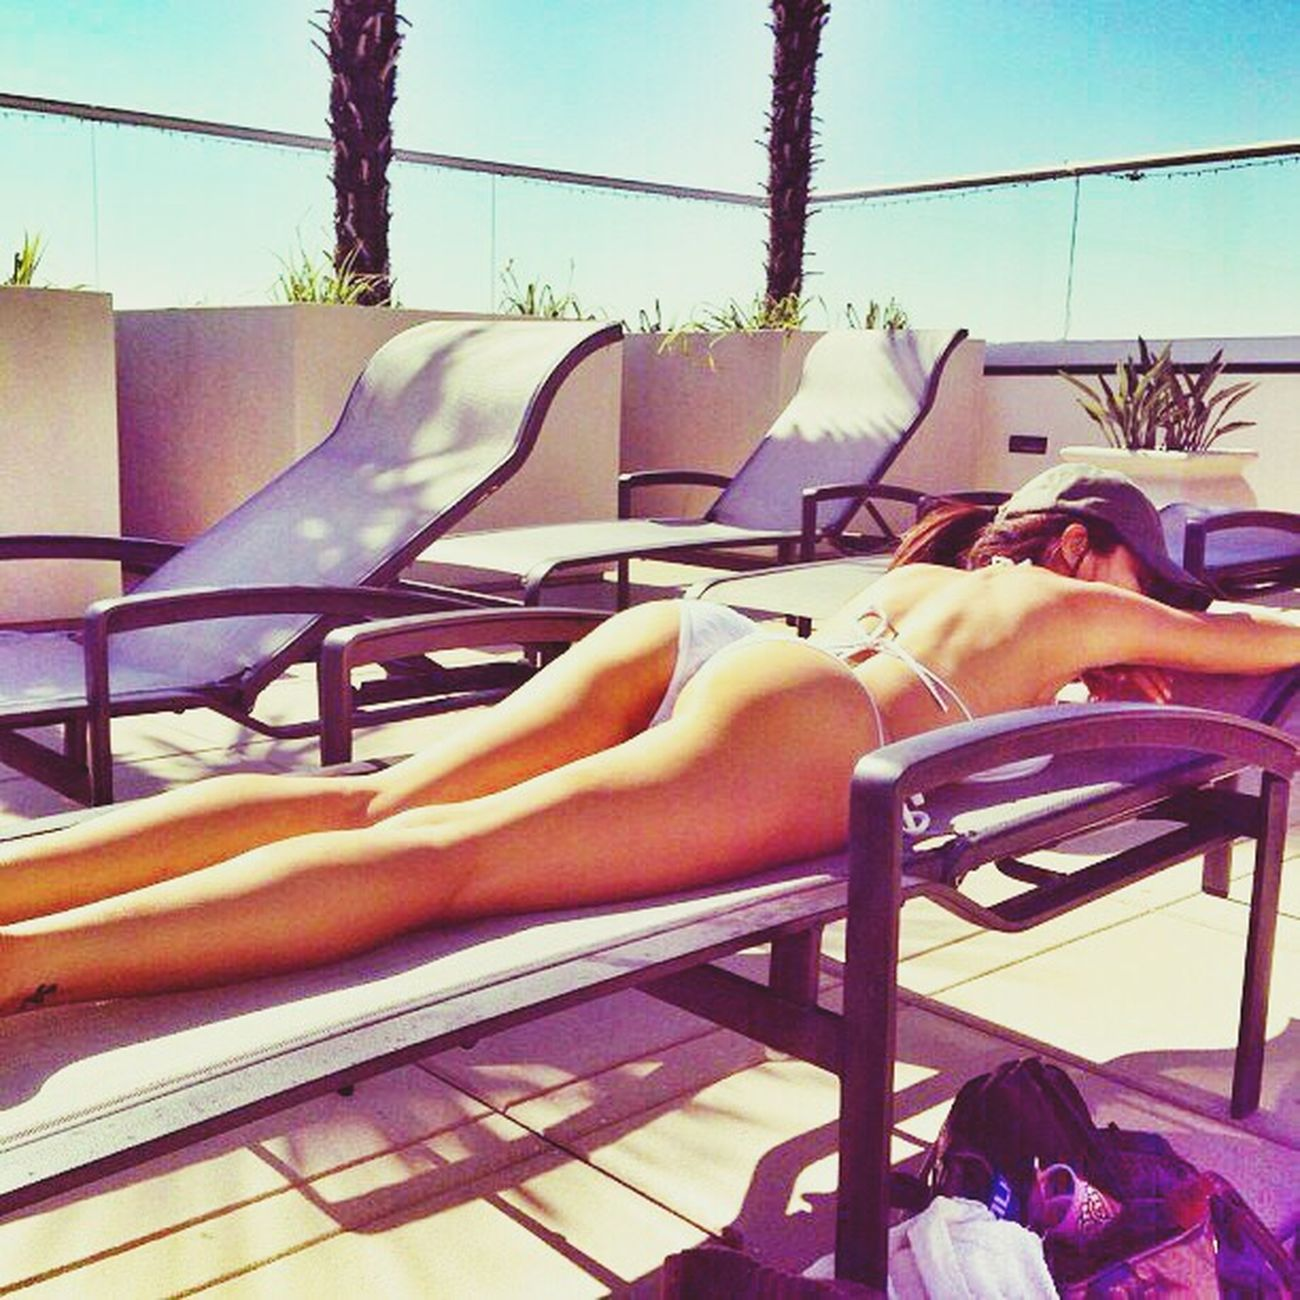 Summertime Amazing Sexygirl Beauty Girl At Malta Bikini Summer2014